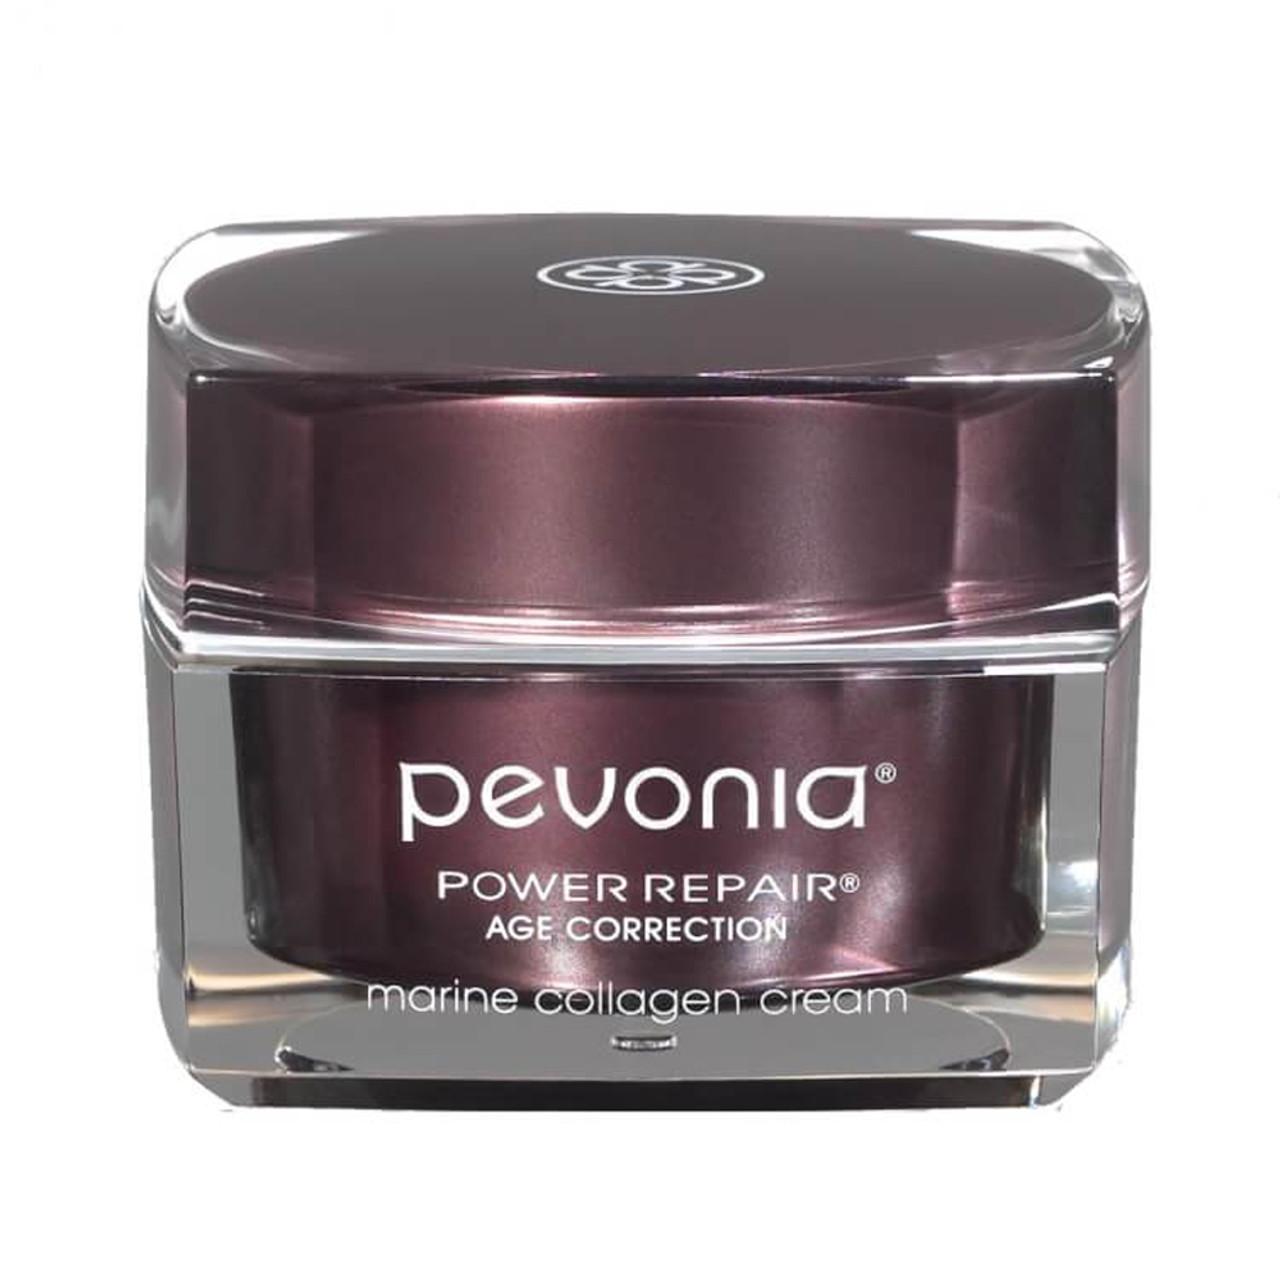 Pevonia Power Repair Age-Defying Marine Collagen Cream